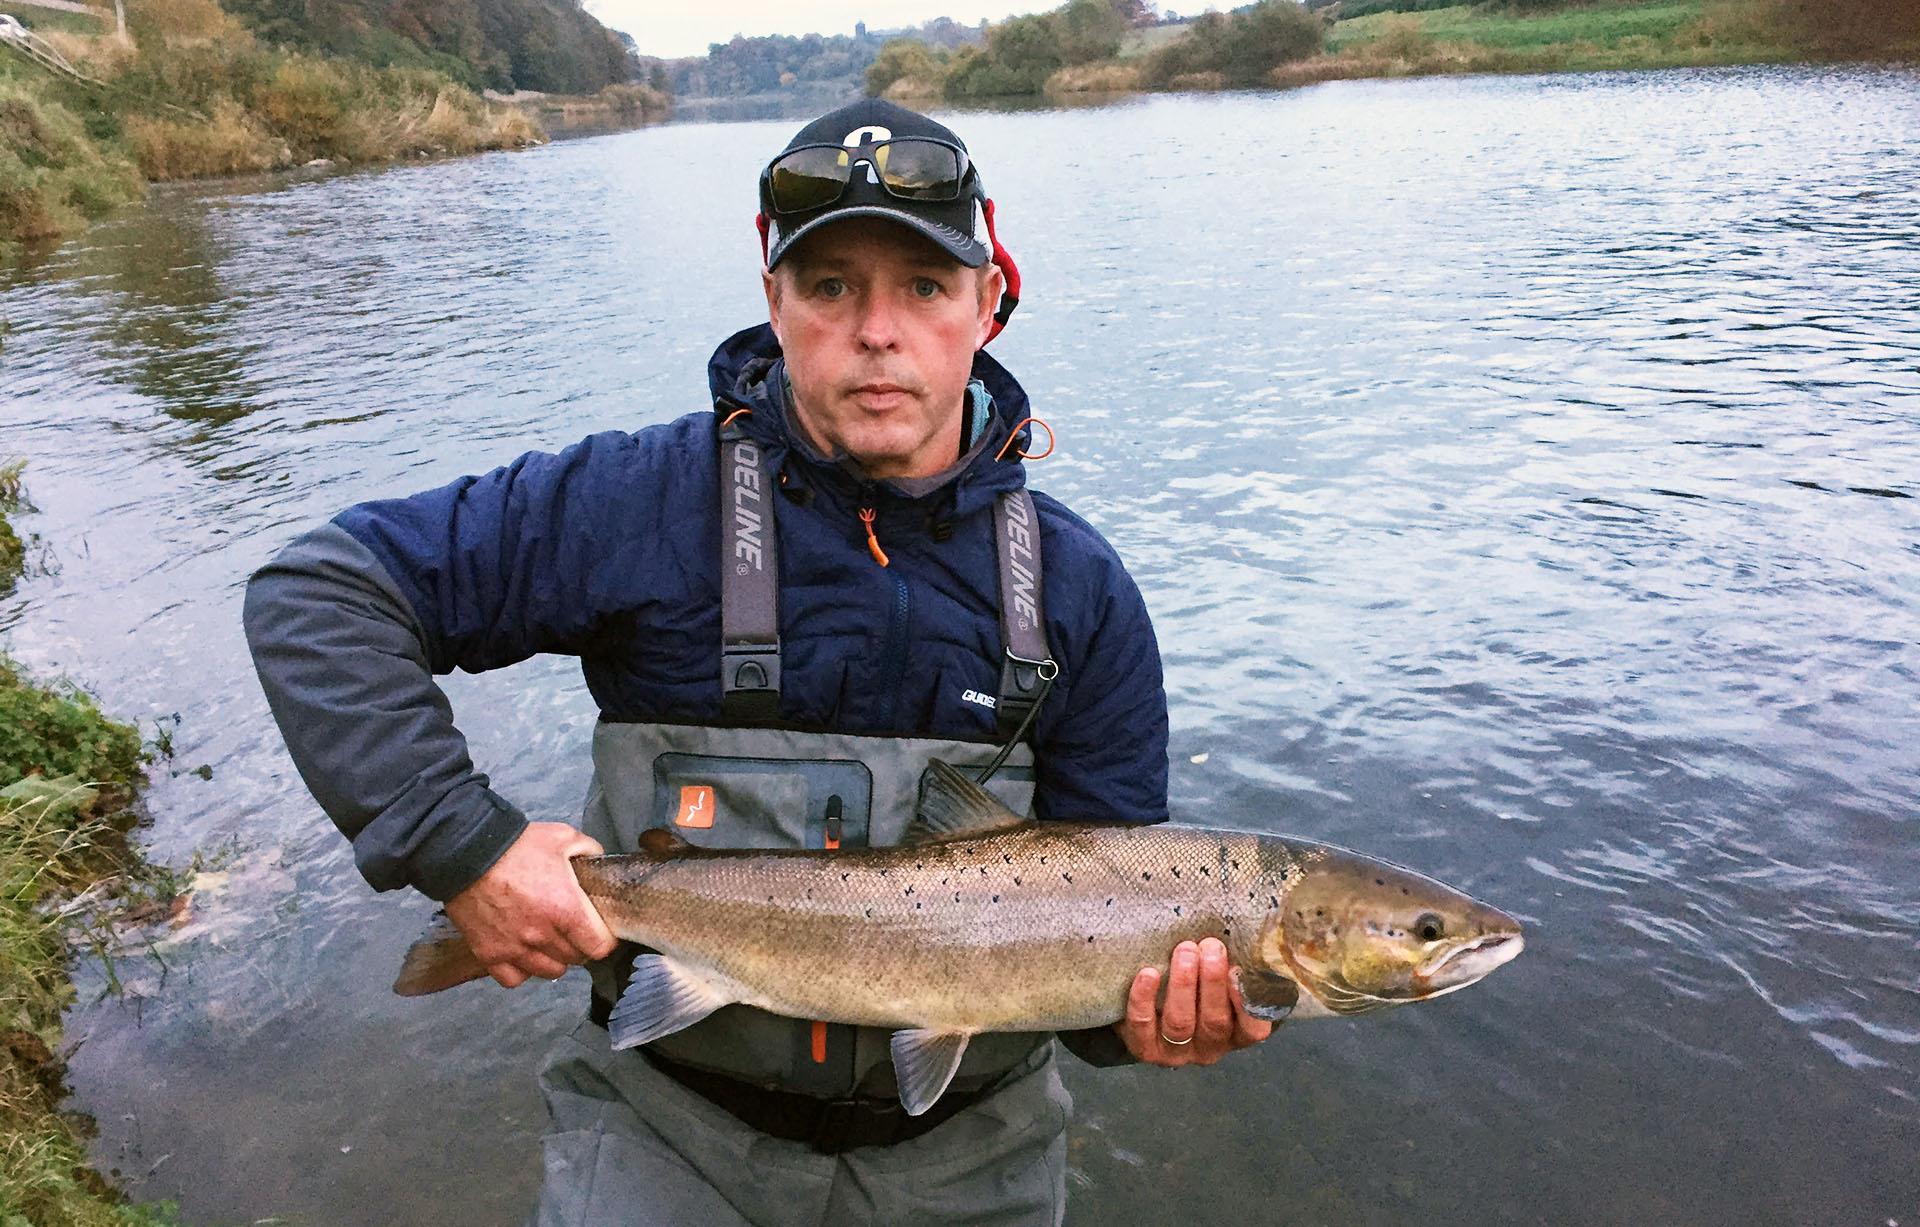 Chris salmon